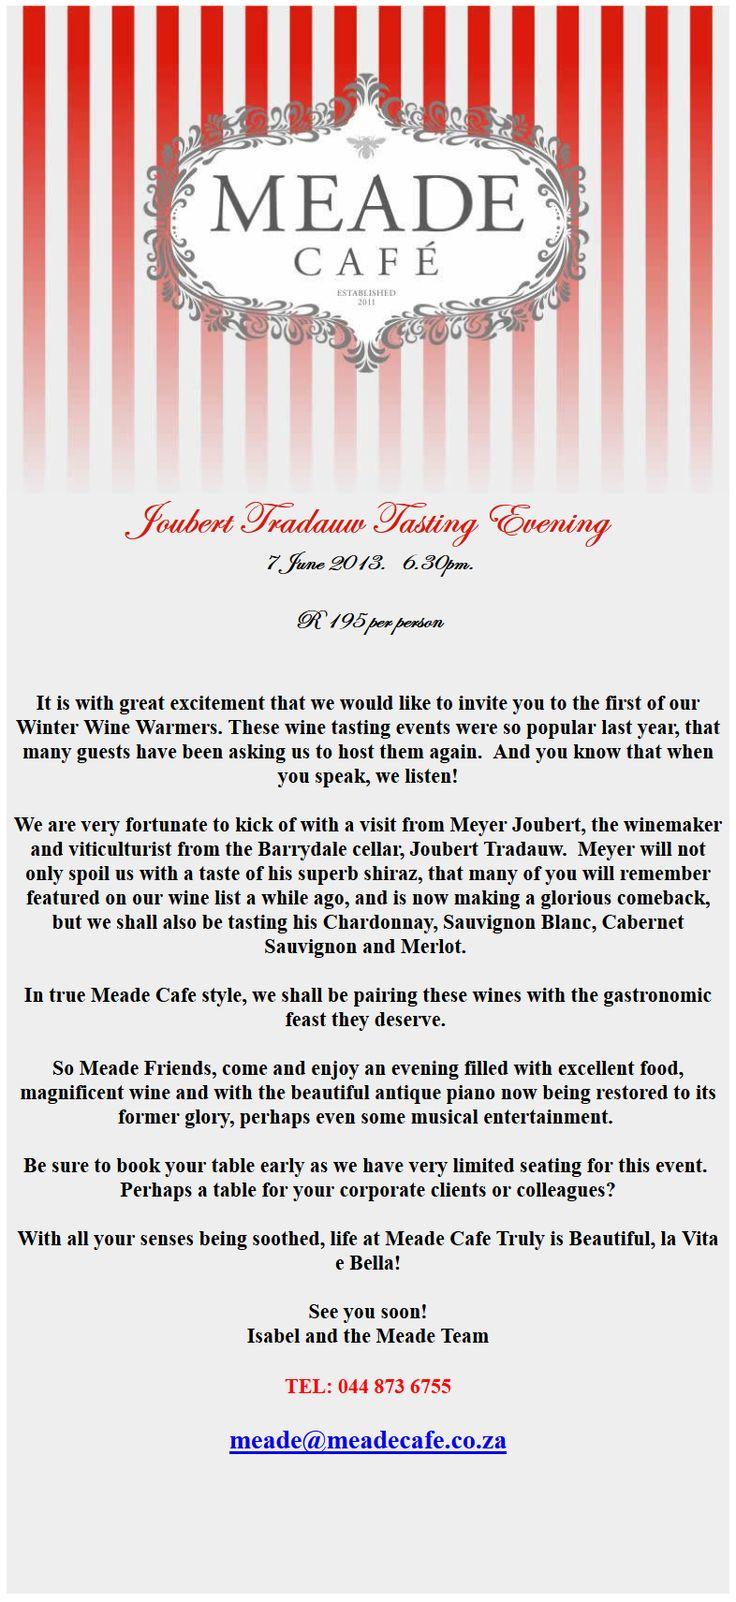 Newsletter: Meade Cafe Joubert Tradauw Tasting ( 27 May 2013 )